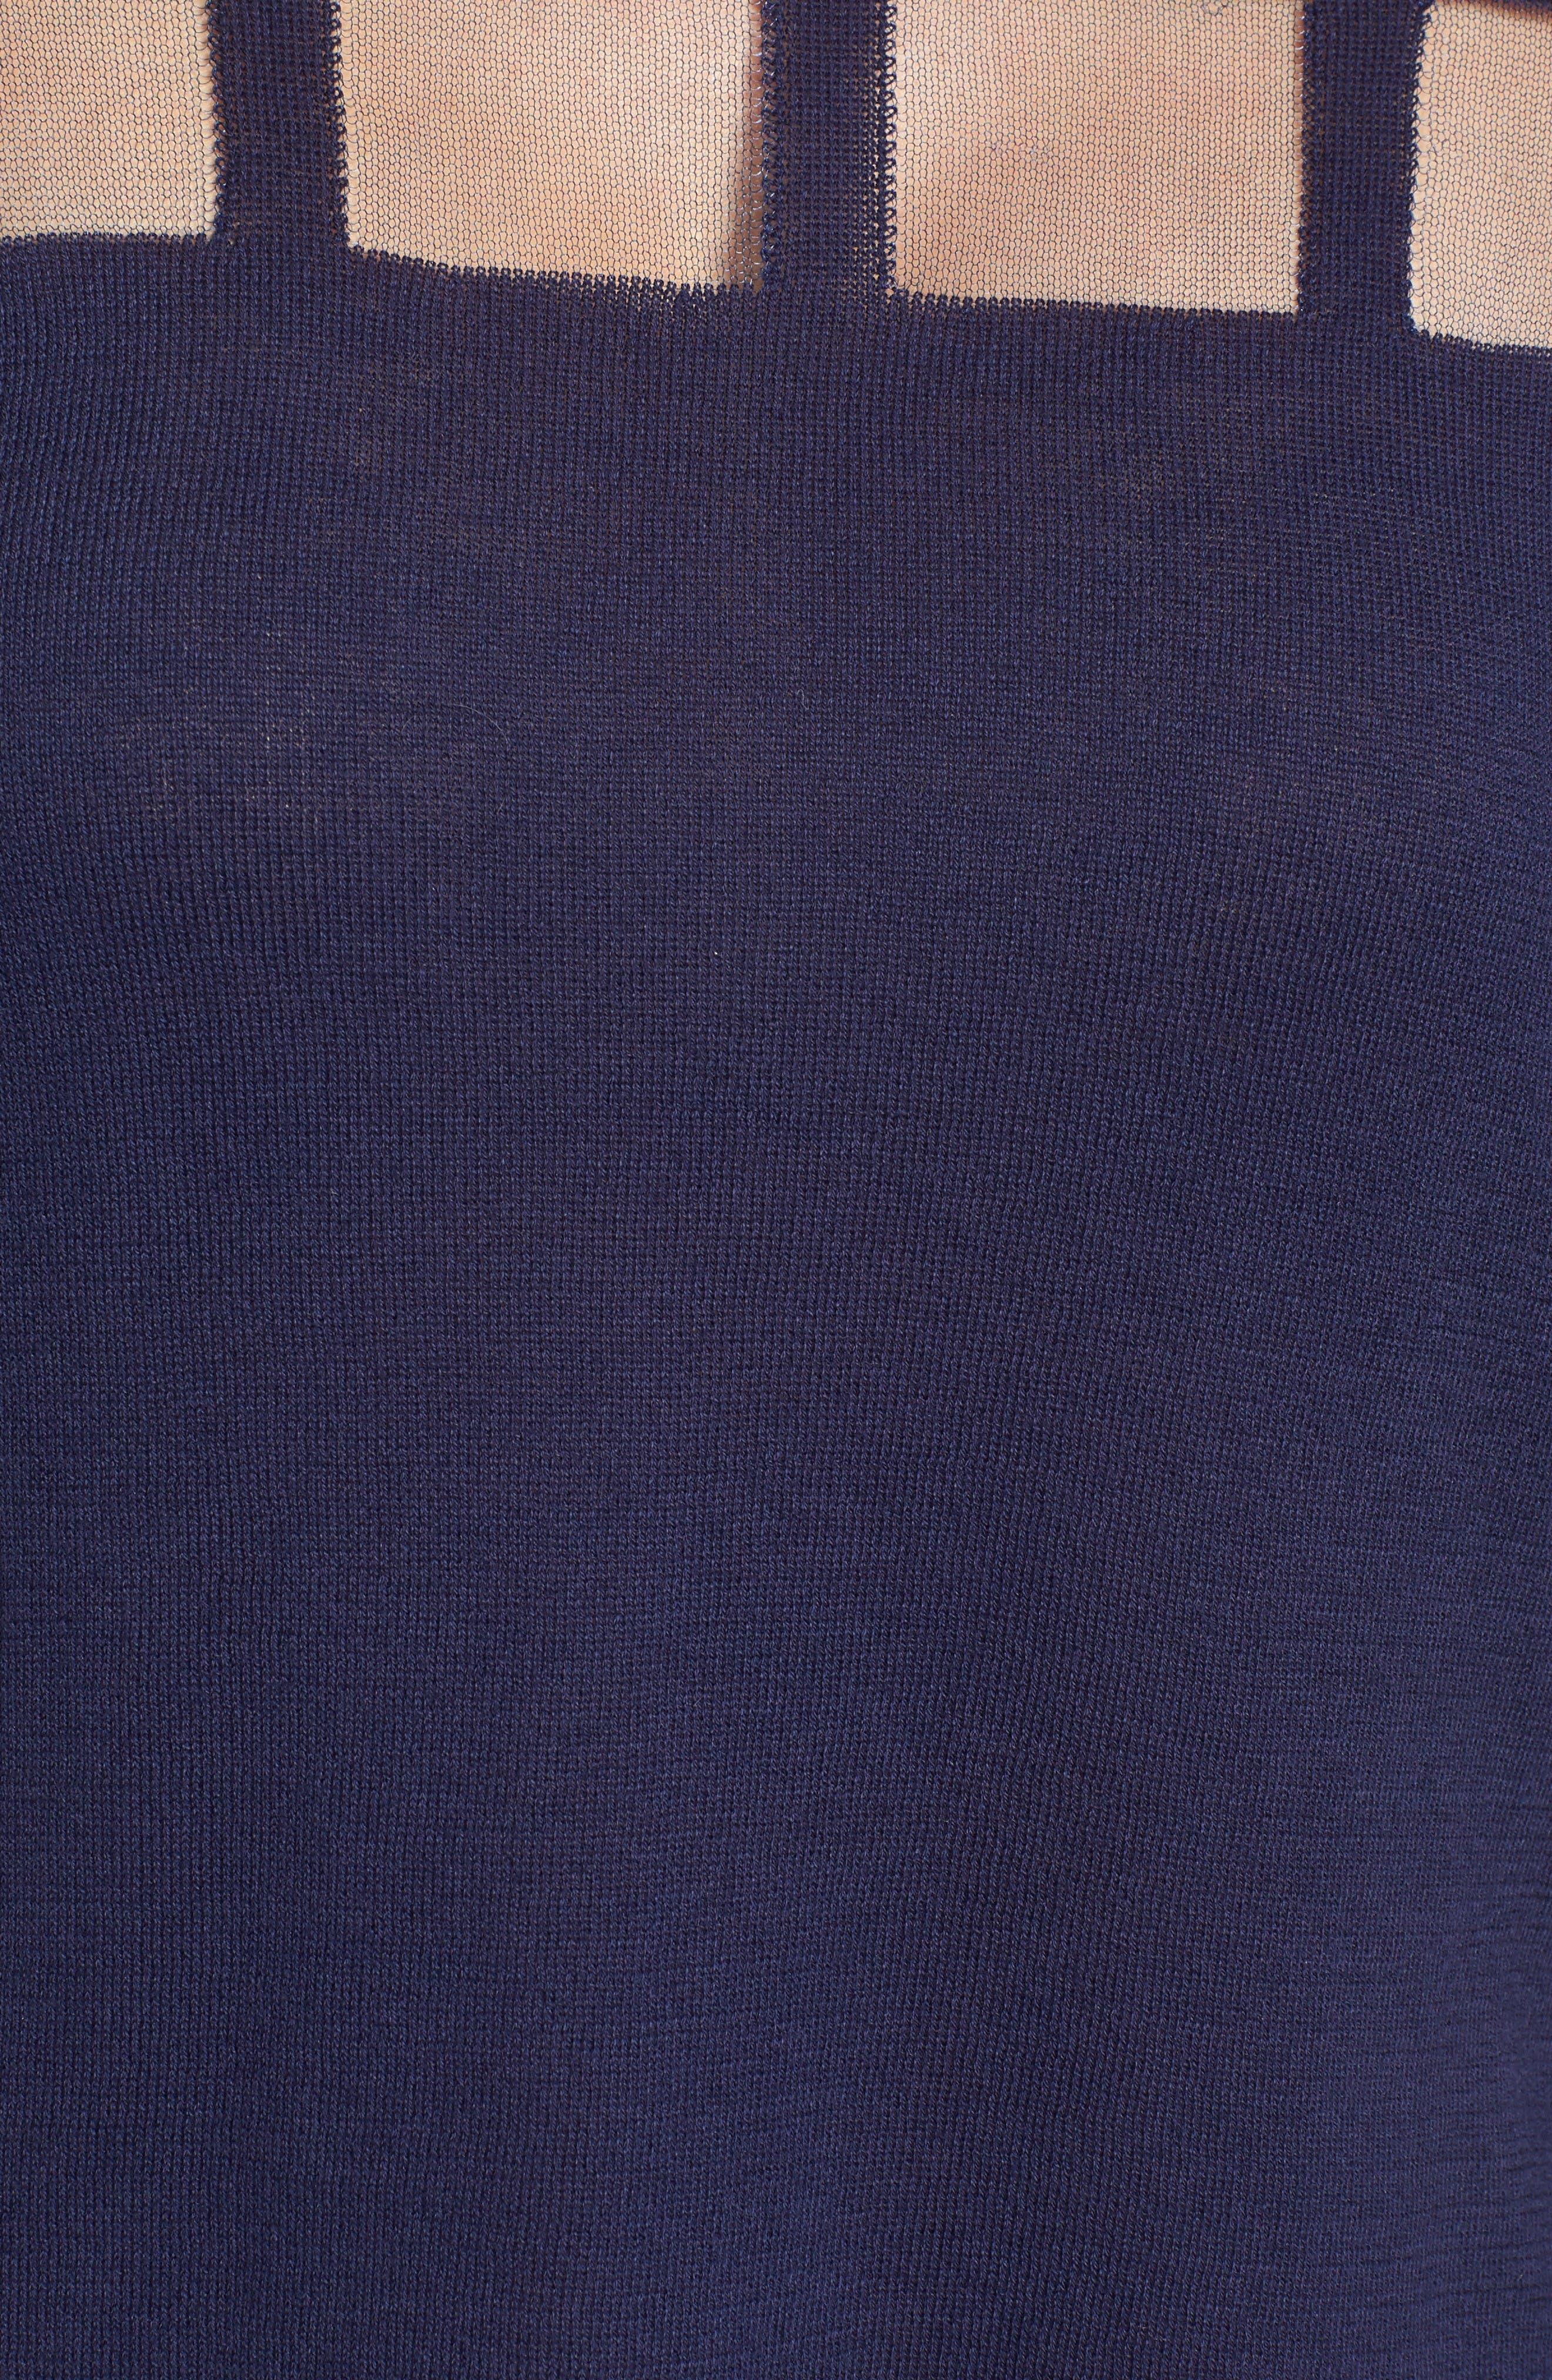 Alternate Image 5  - Trouvé Sheer Grid Yoke Sweater